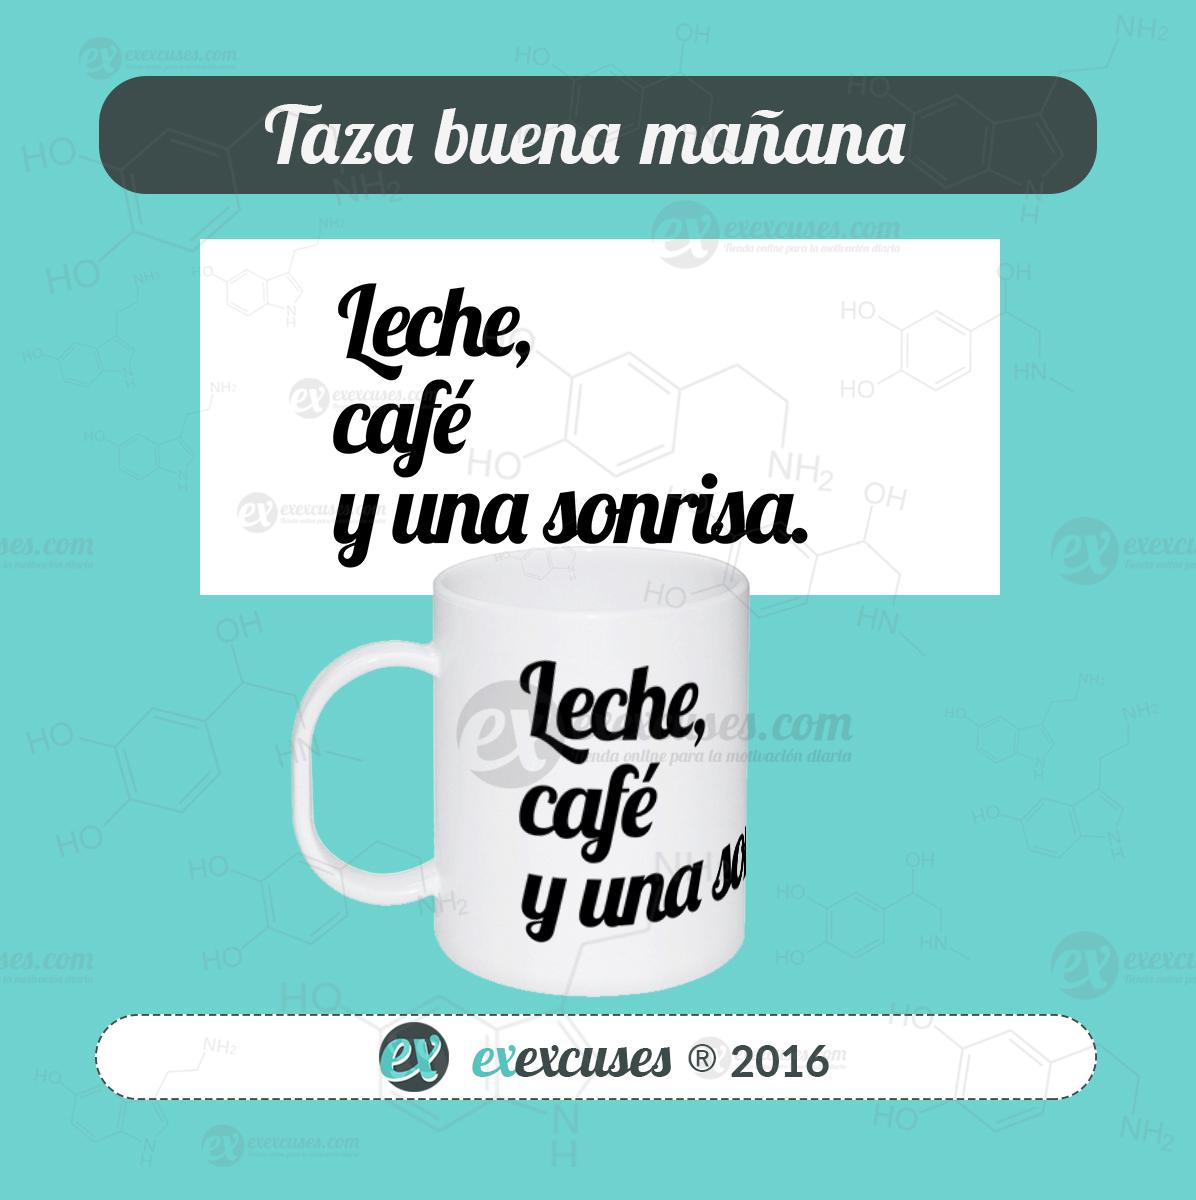 Taza mágica leche cafe sonrisa exexcuses®